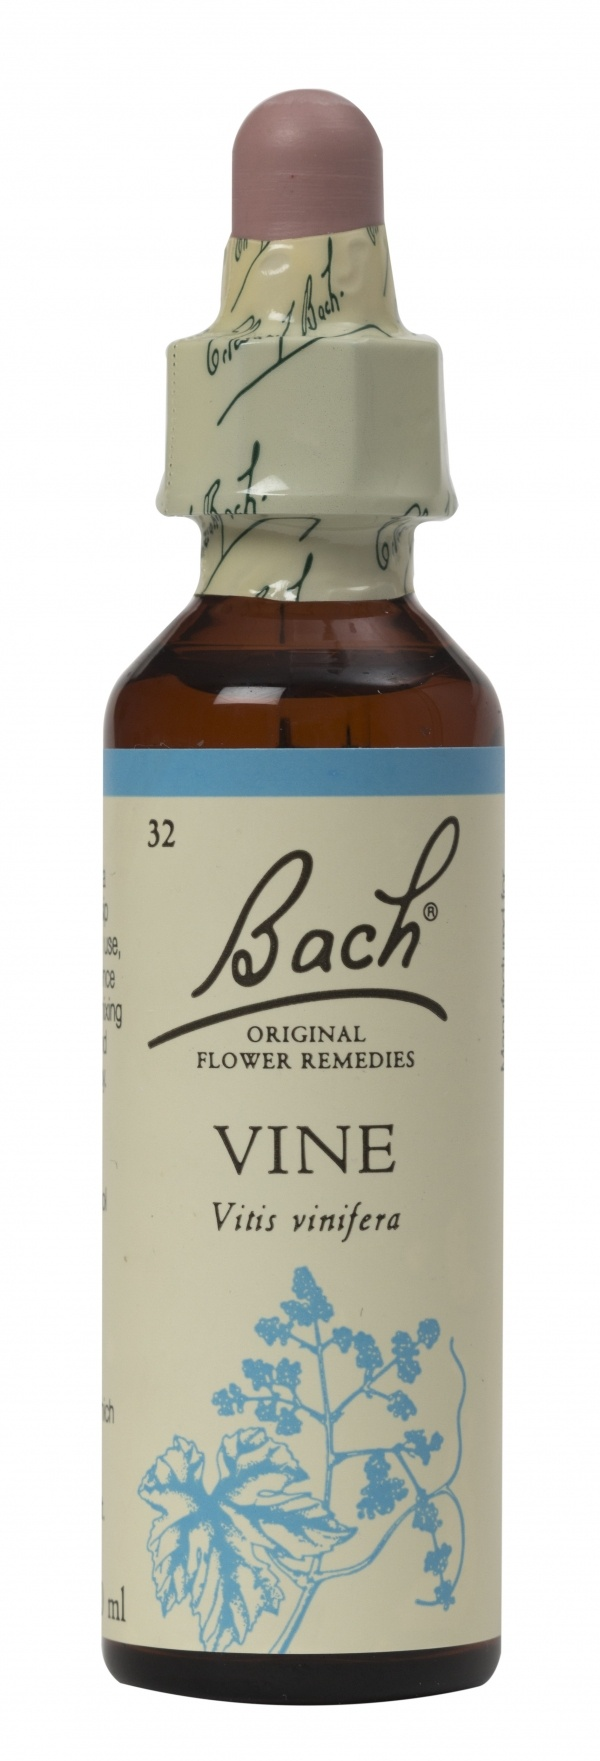 Bach Flower Remedy Vine 20ml